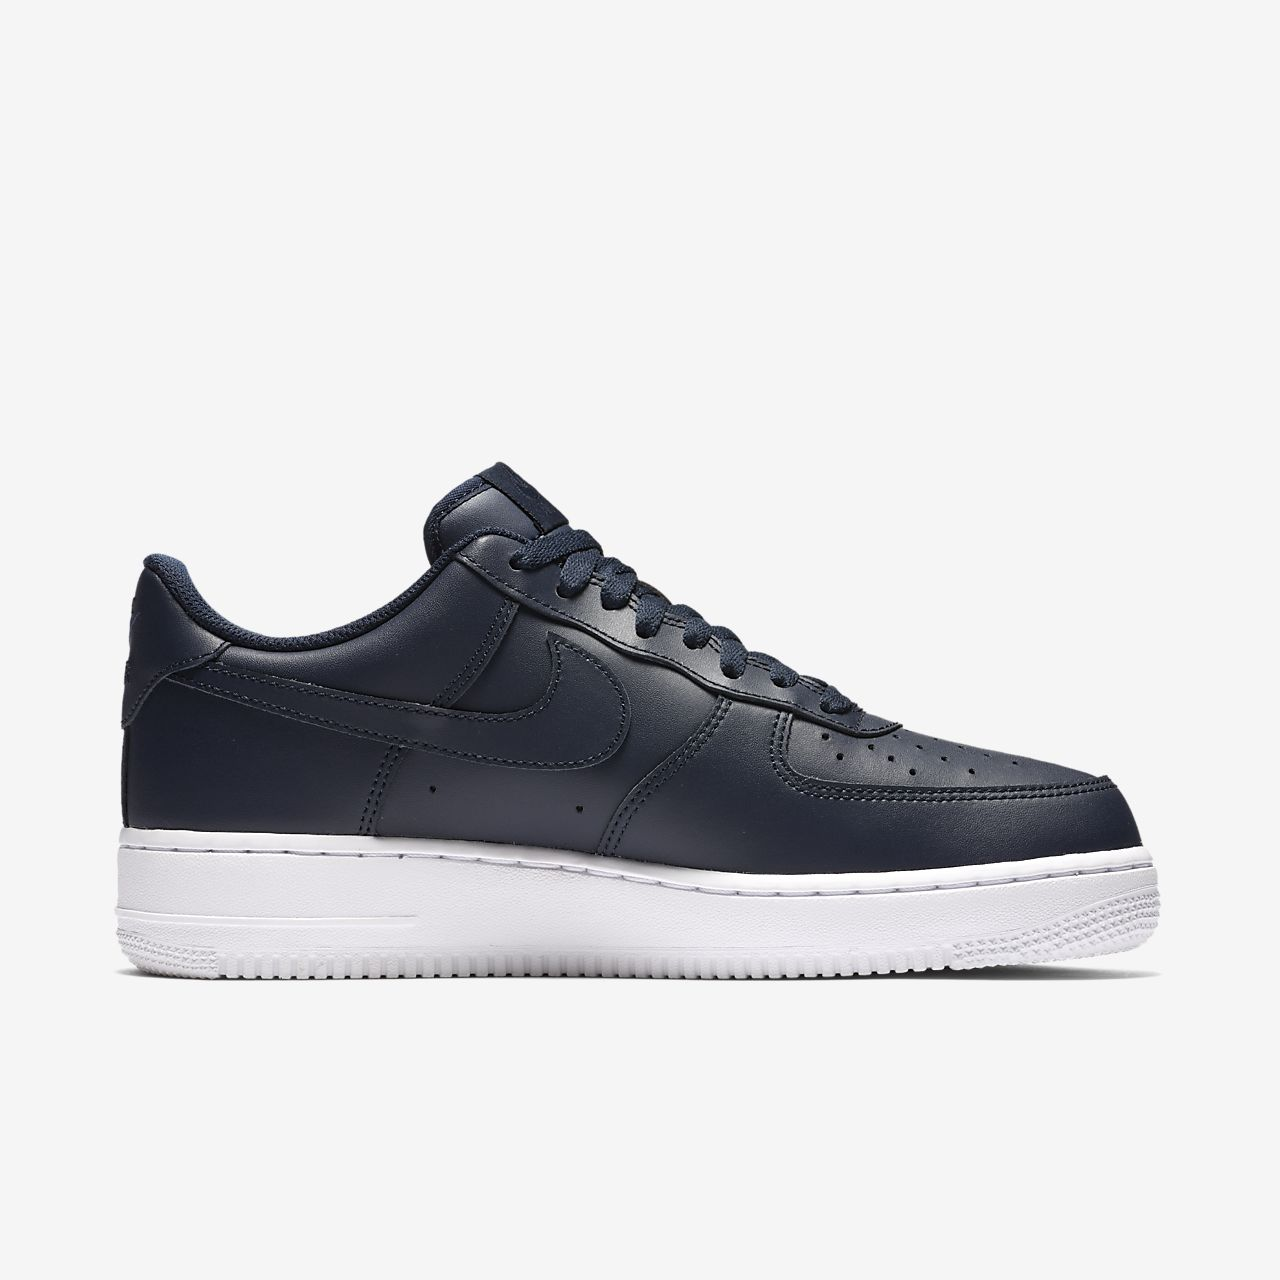 d8f0348d226 Ανδρικό παπούτσι Nike Air Force 1 07. Nike.com GR